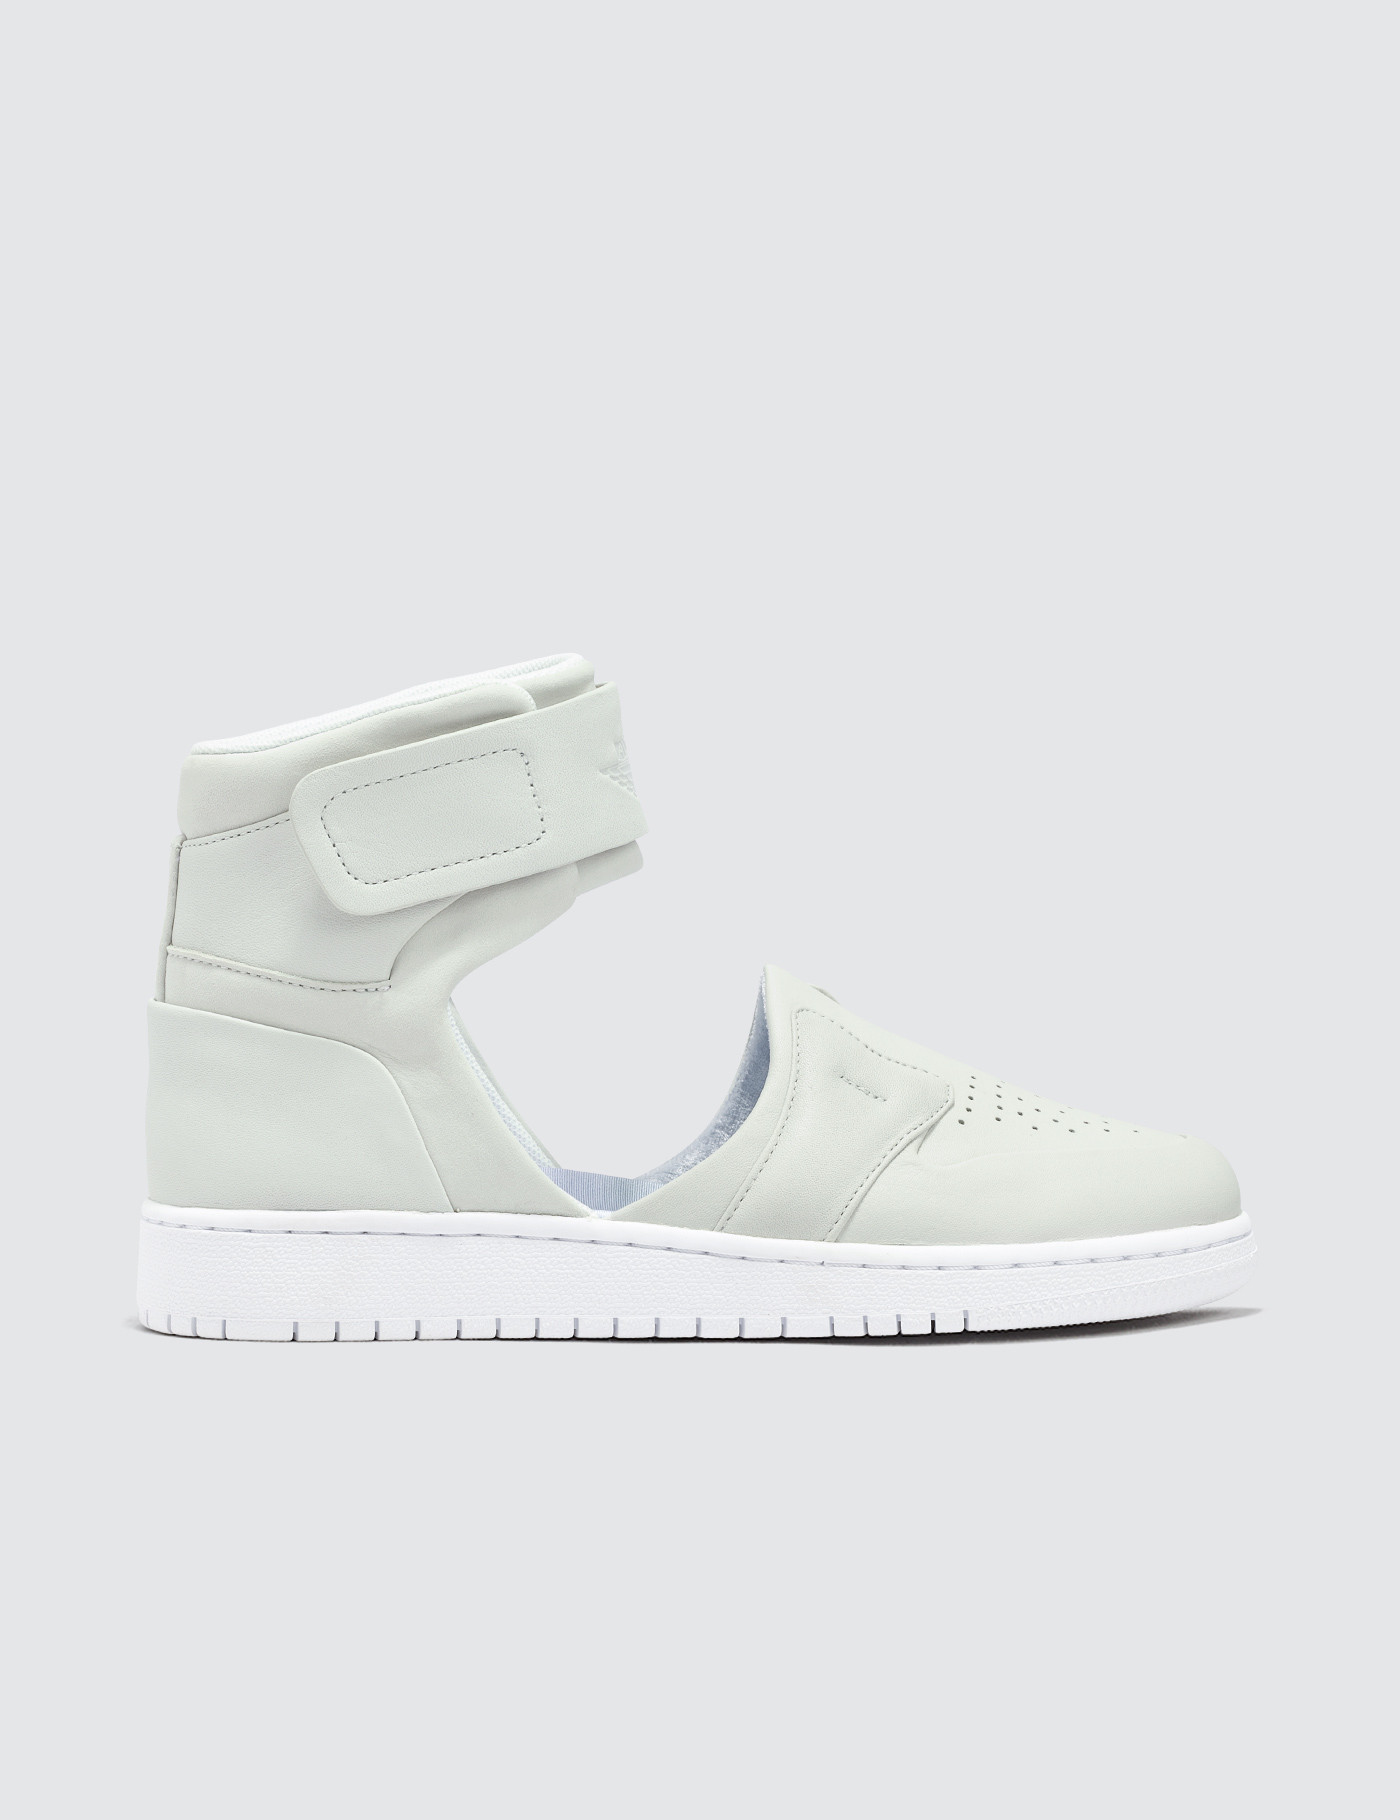 Jordan Brand Wmns Air Jordan 1 Lover XX